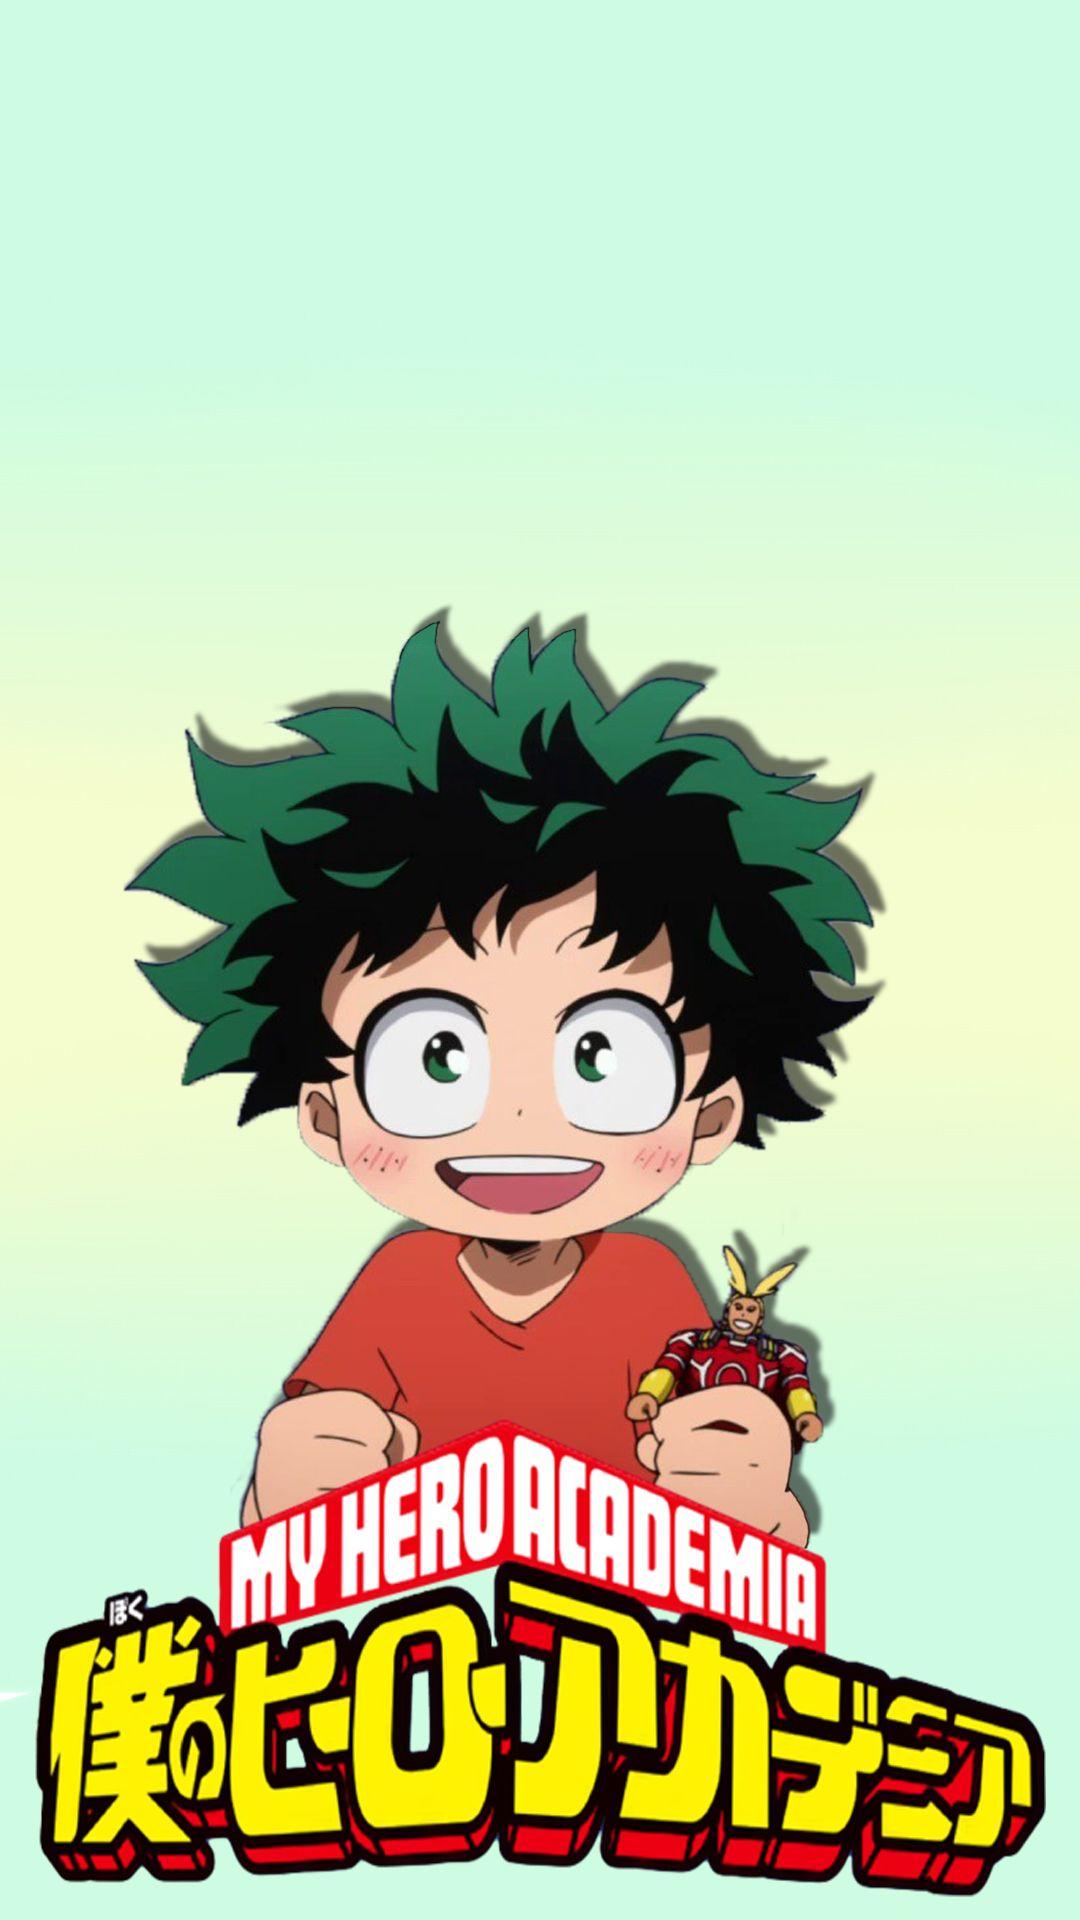 anime lockscreen Tumblr Anime, Izuku midoriya, Deku